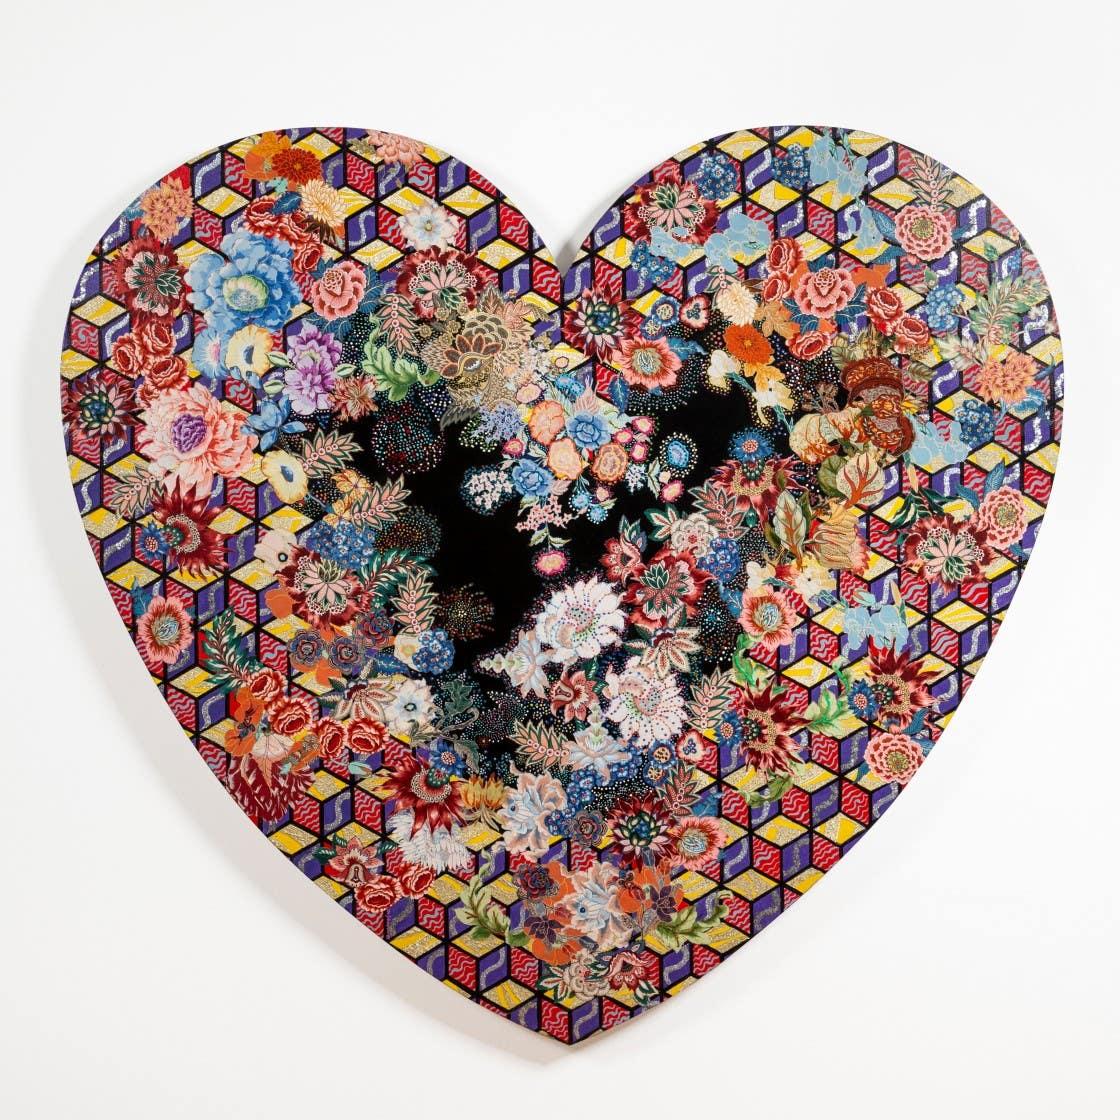 "Miriam Schapiro ""Heartland"" on view at MOCA"